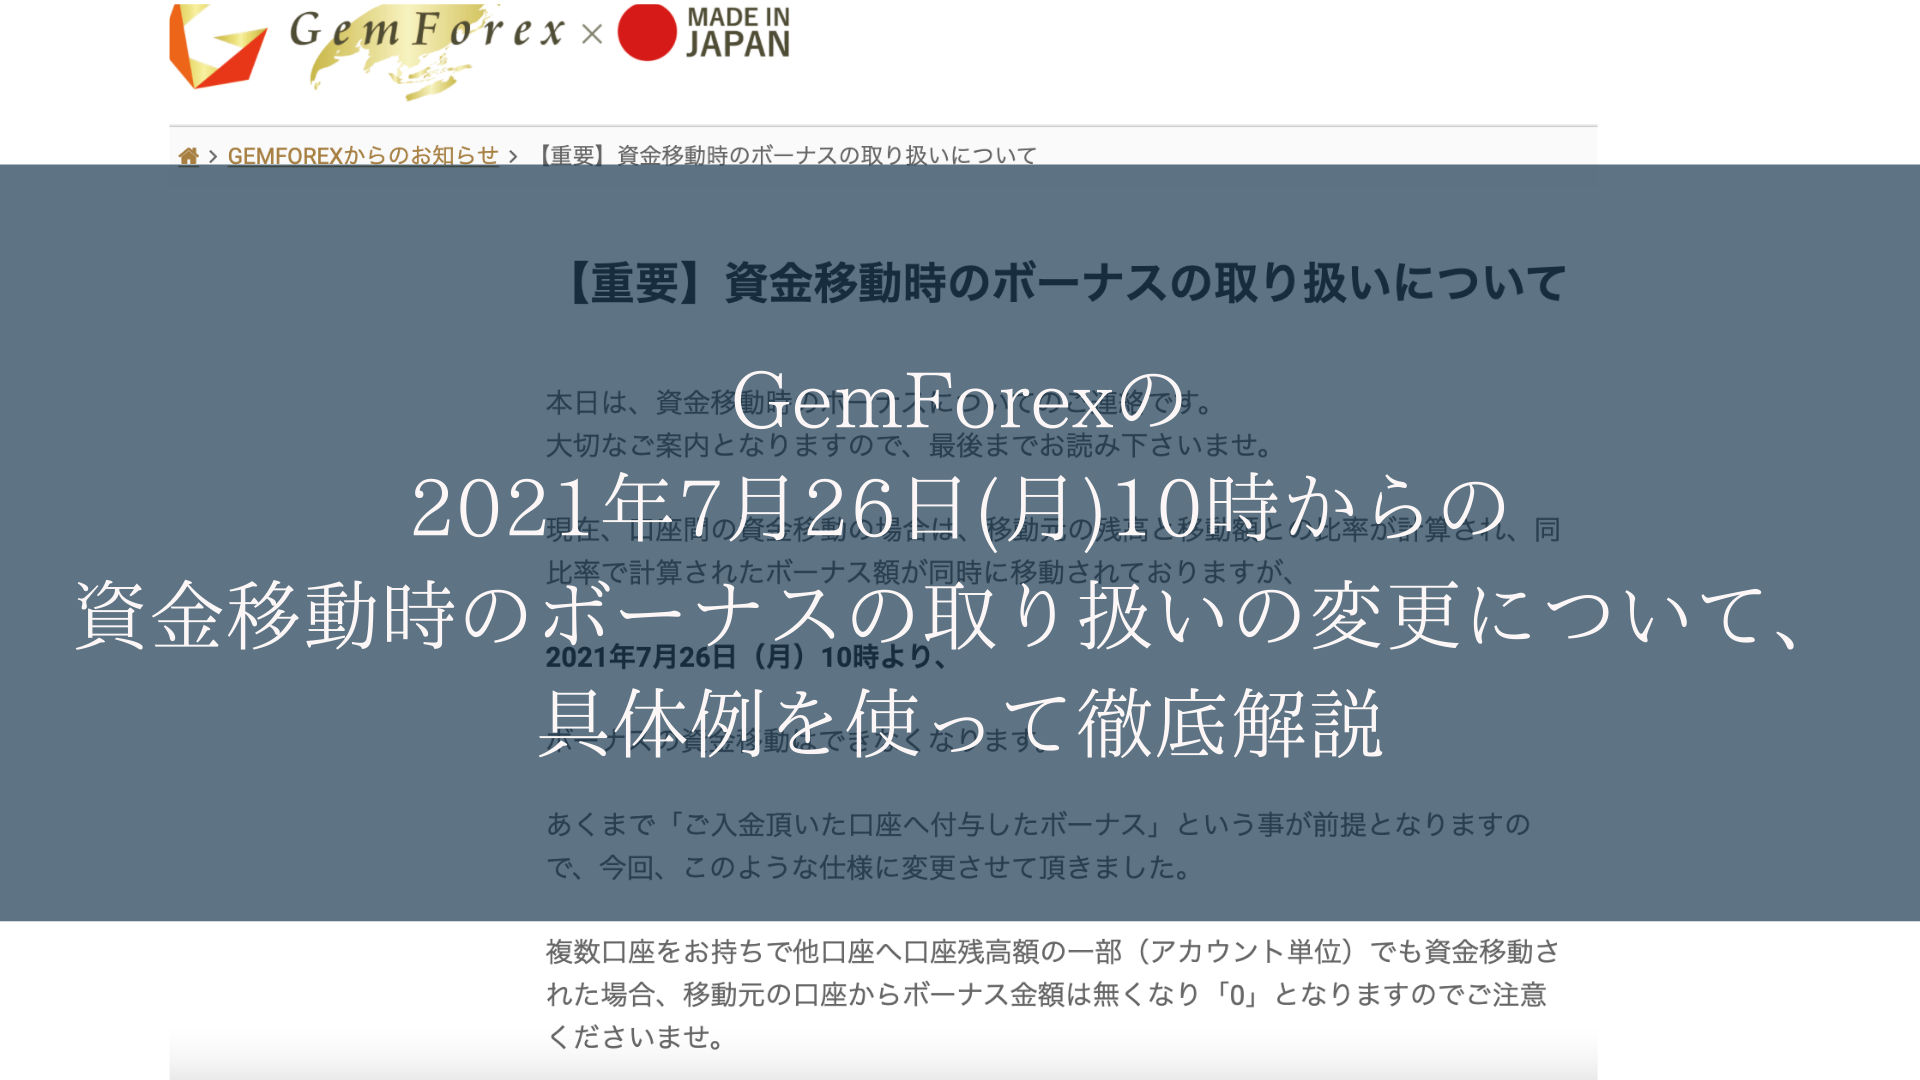 GemForexの2021年7月26日(月)10時からの資金移動時のボーナスの取り扱いの変更について、具体例を使って徹底解説